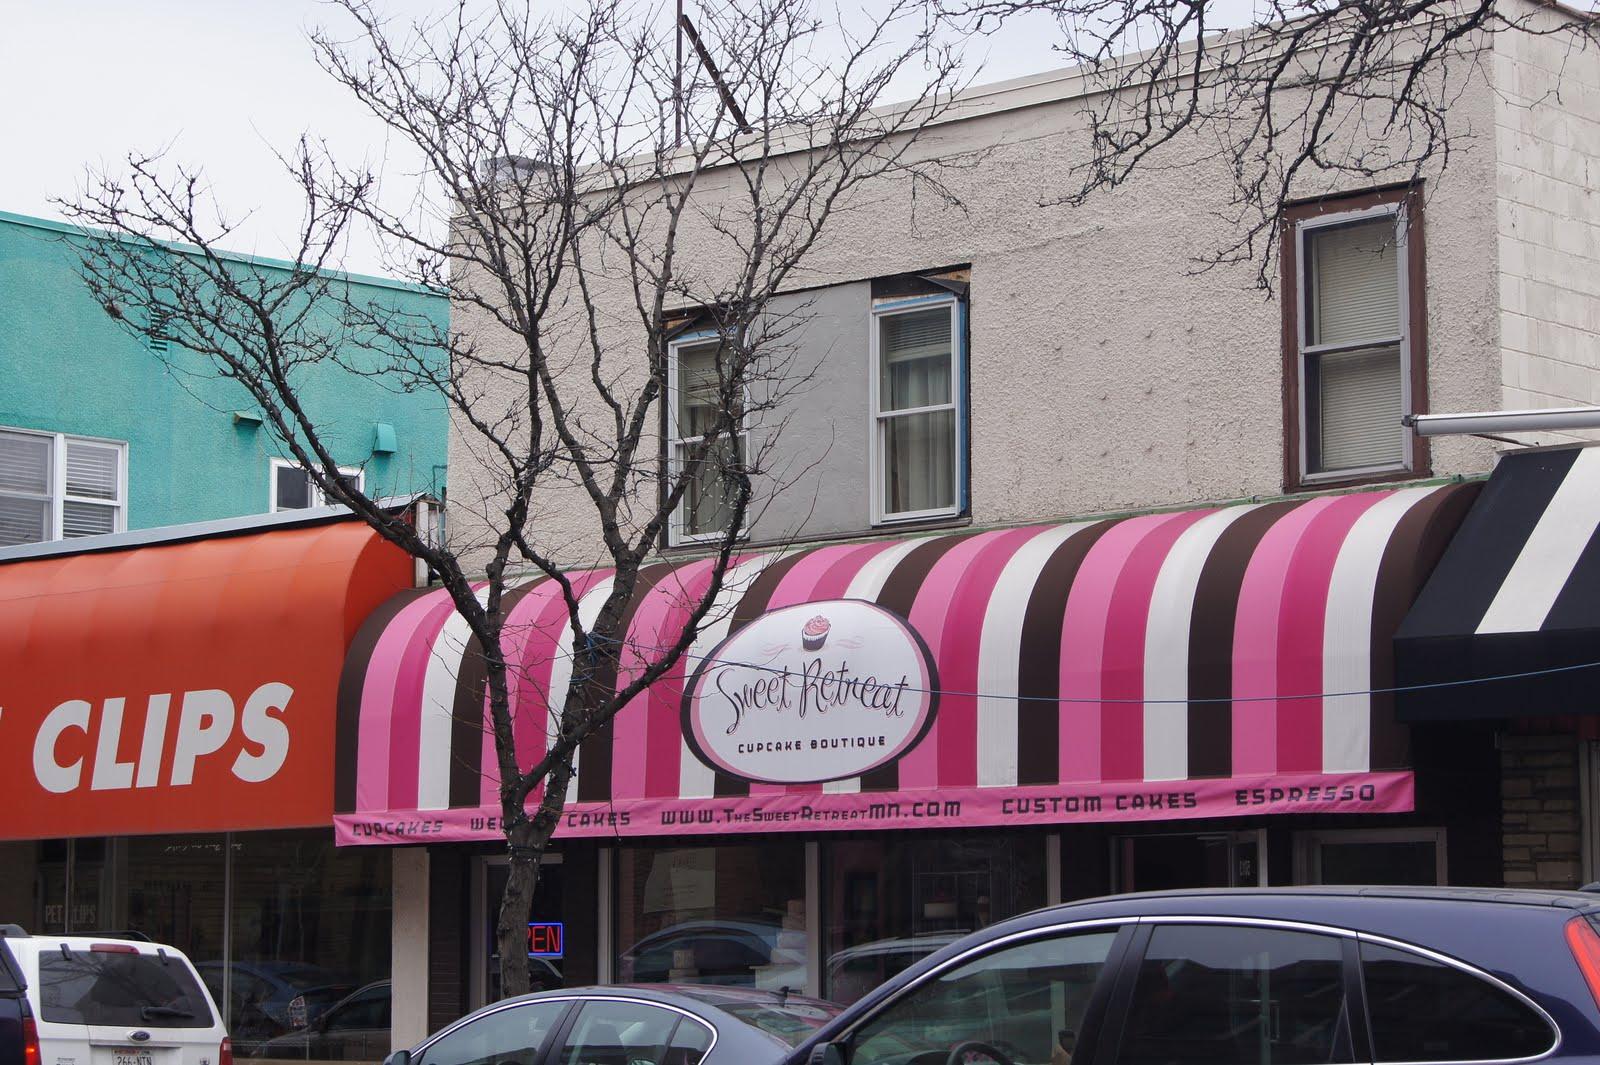 Sweet Retreat Cupcake Boutique - Minneapolis, MN